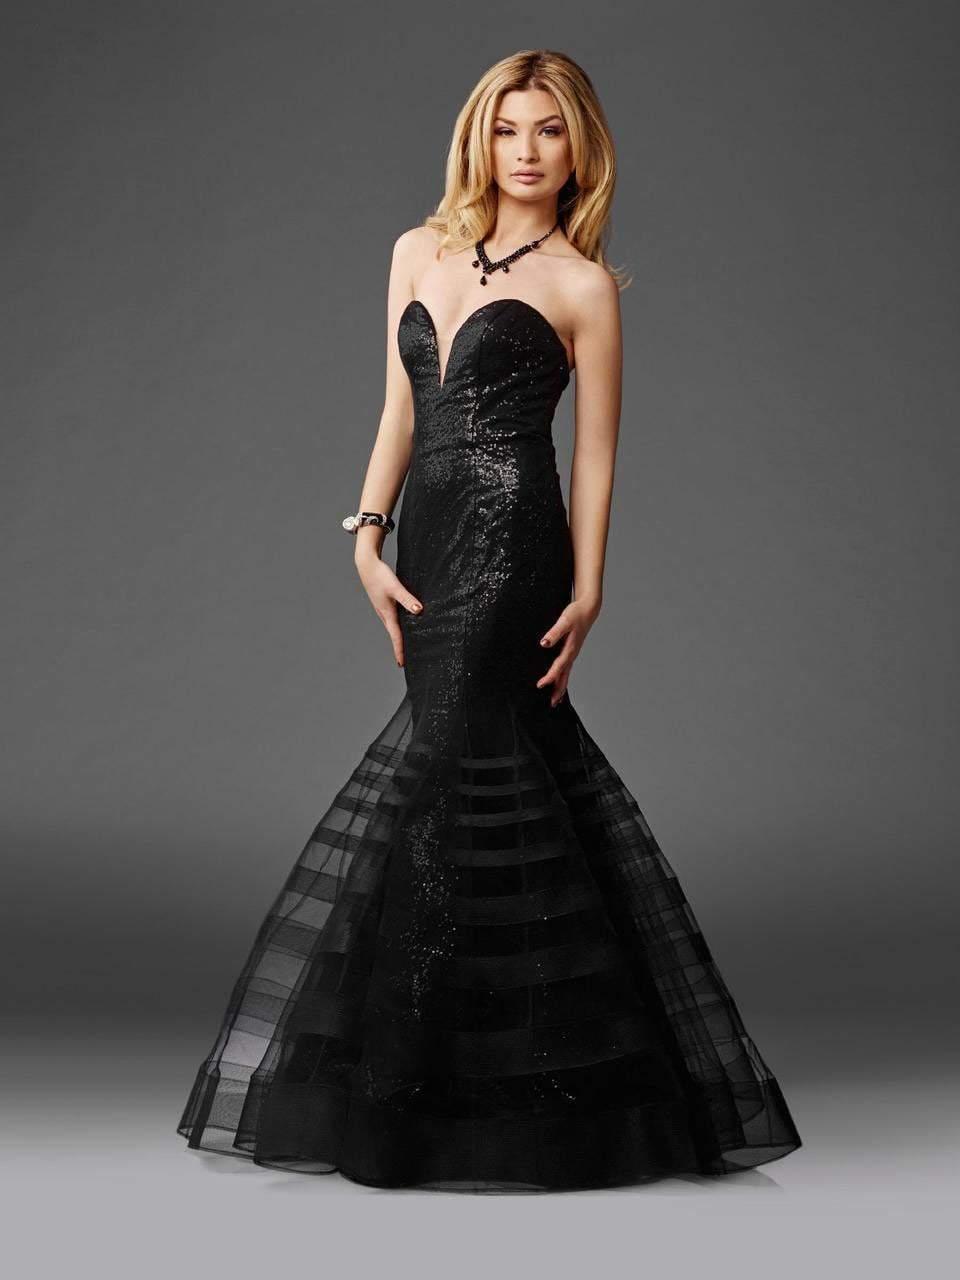 Clarisse - 4950 Strapless Sequined Mermaid Dress